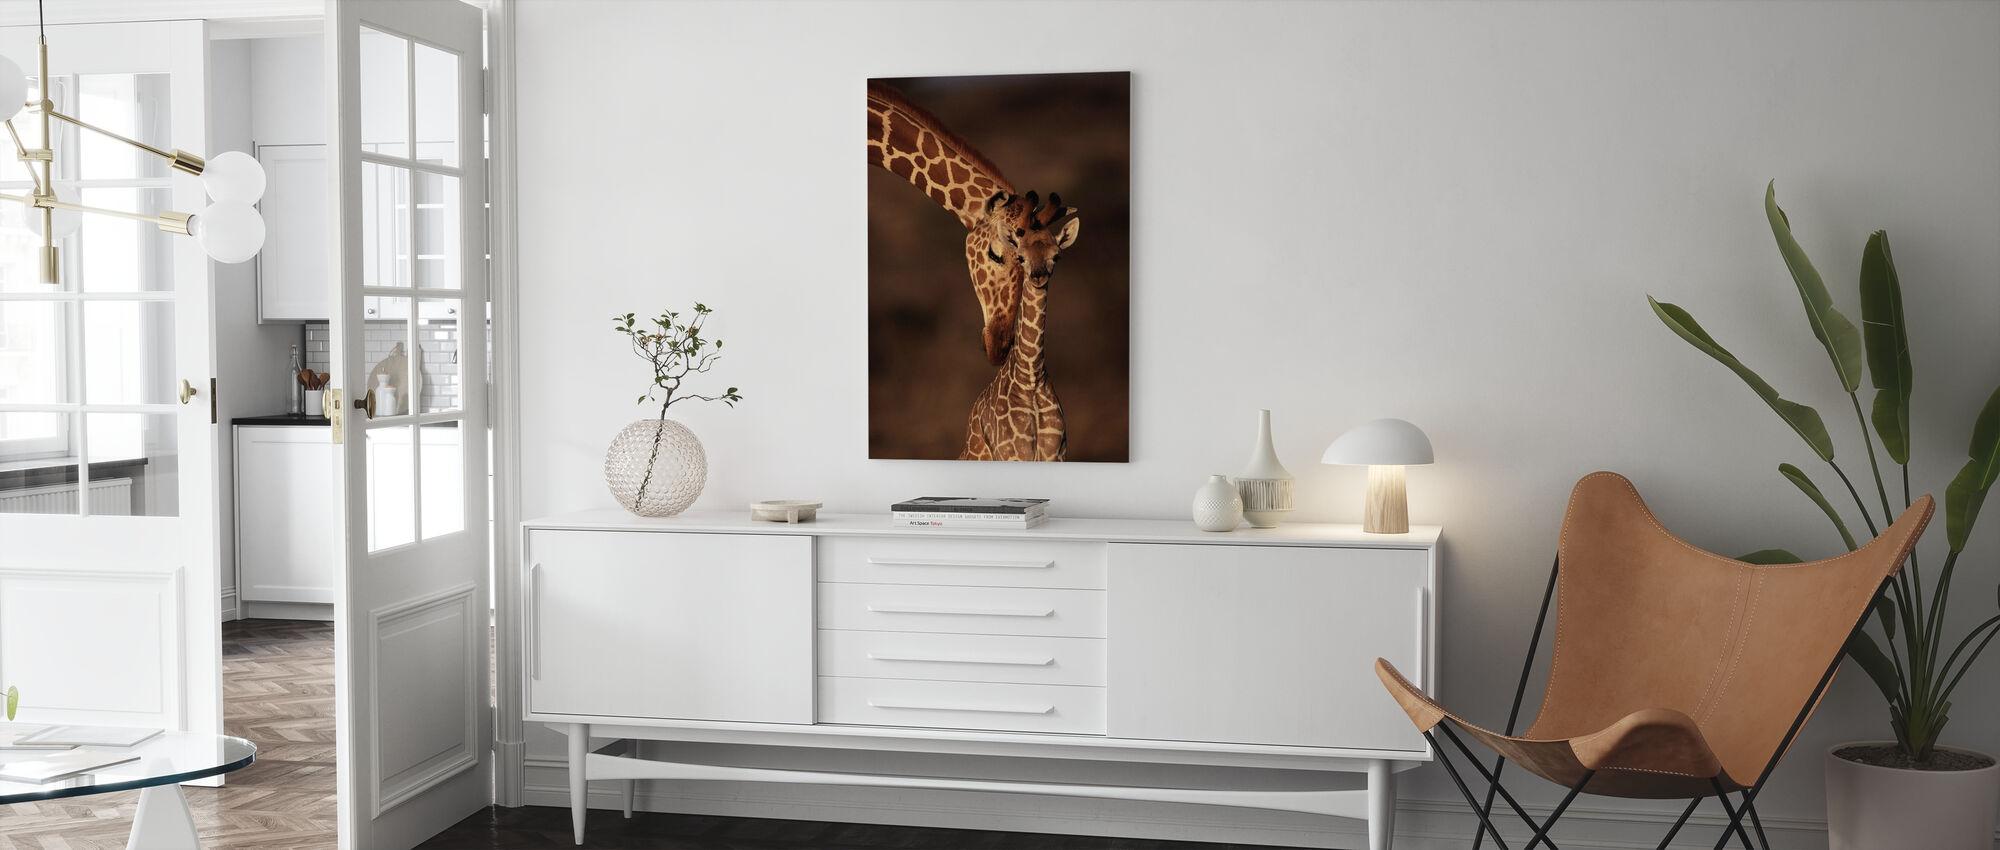 Giraffes - Canvas print - Living Room